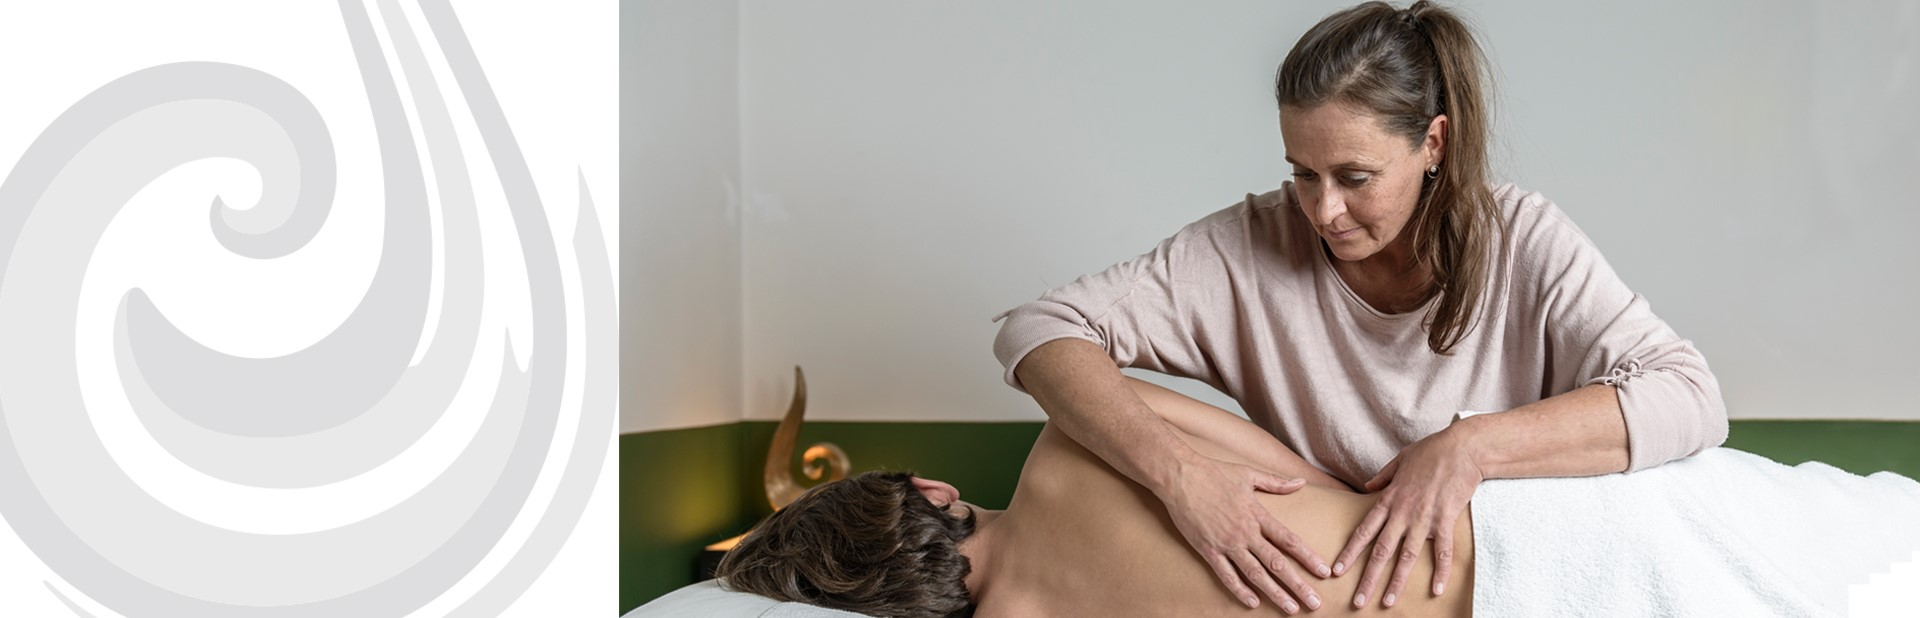 Physiotherapie Osteopathie Putzker Innsbruck